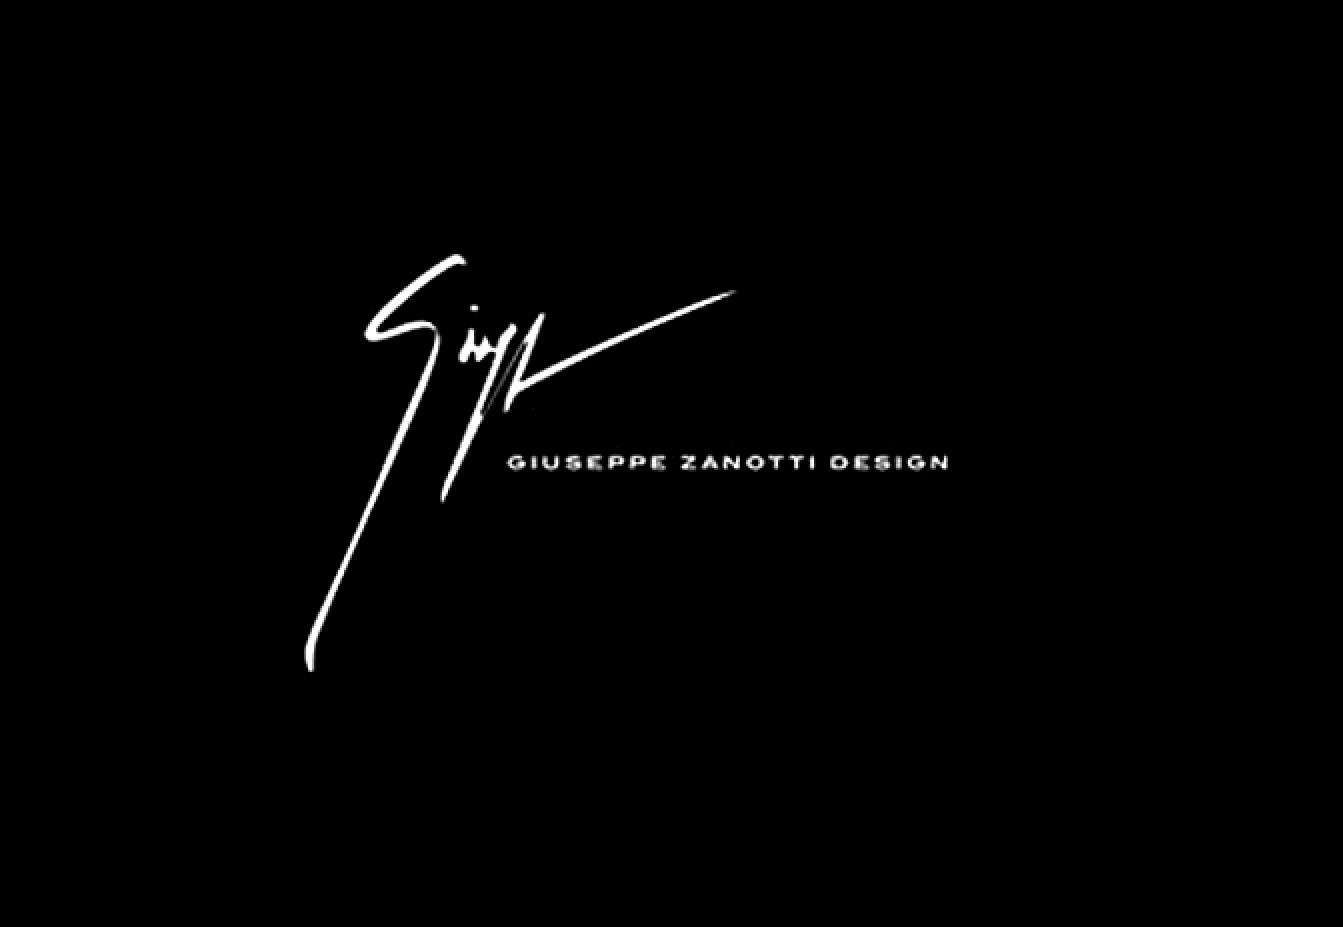 Giuseppe zanotti logo clipart